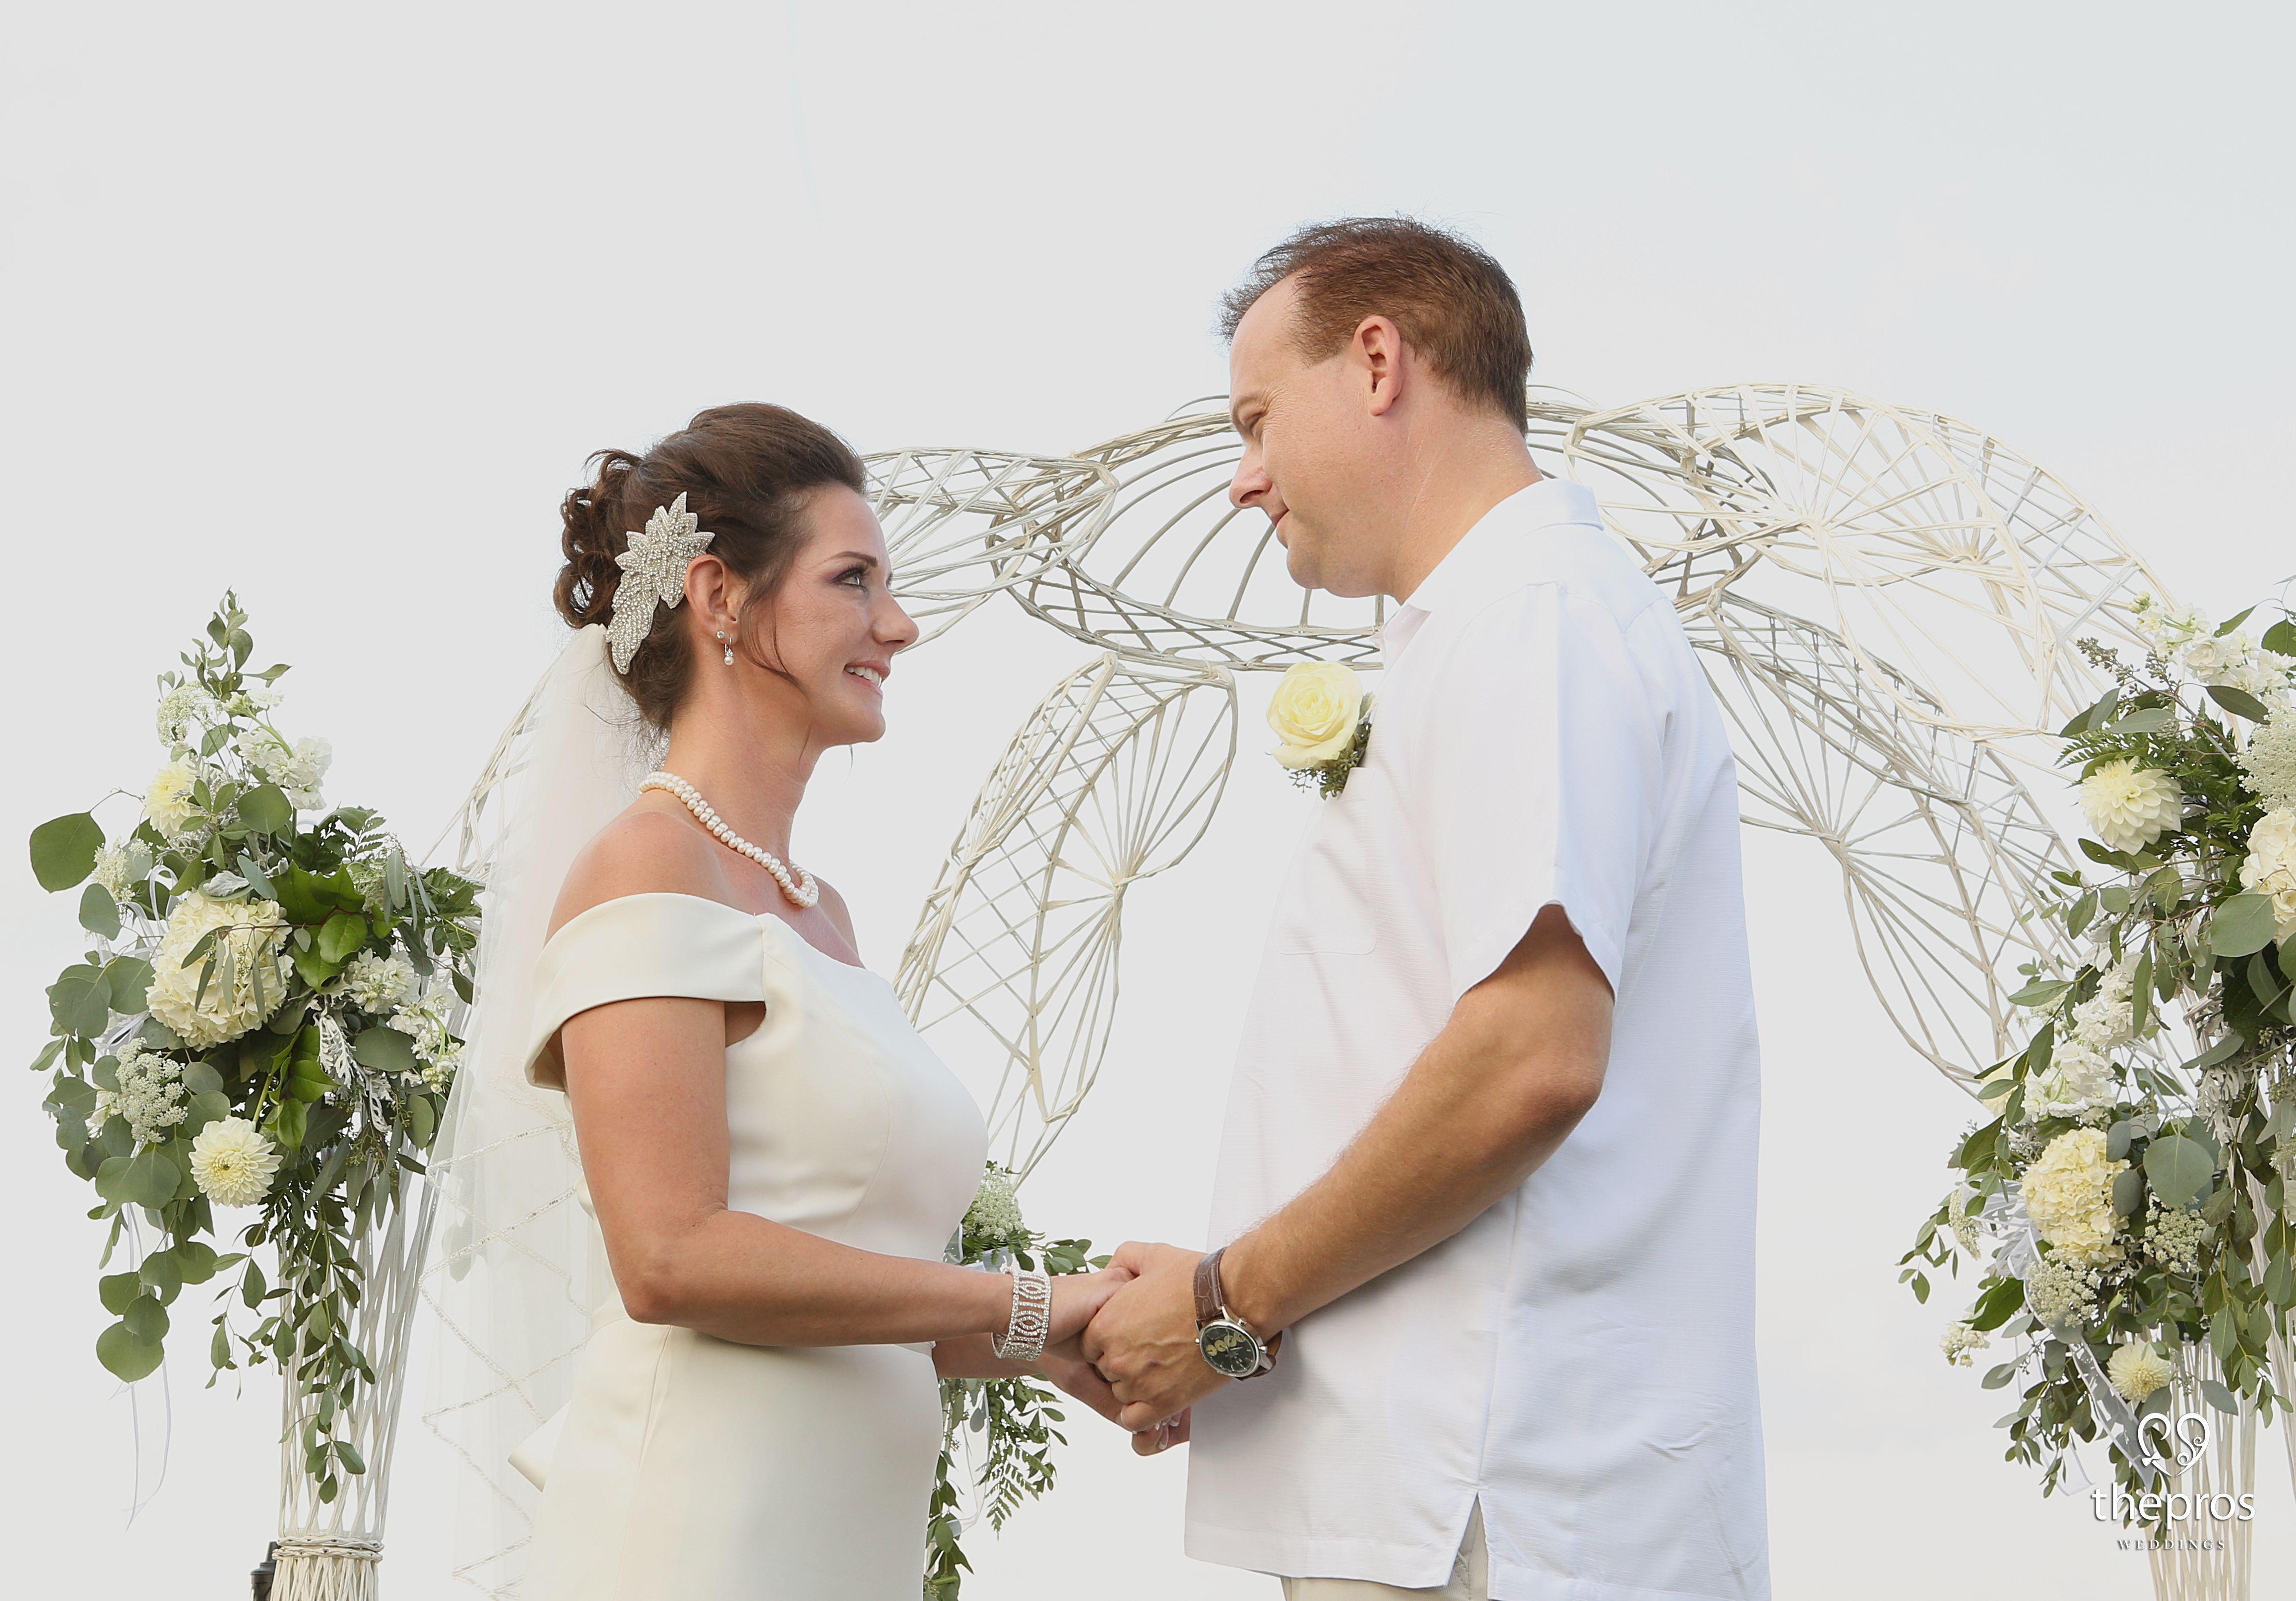 Douglas Rachel Say I Do In Hudsonville Mi Blog The Pros Wedding Ceremony Real Weddings Wedding